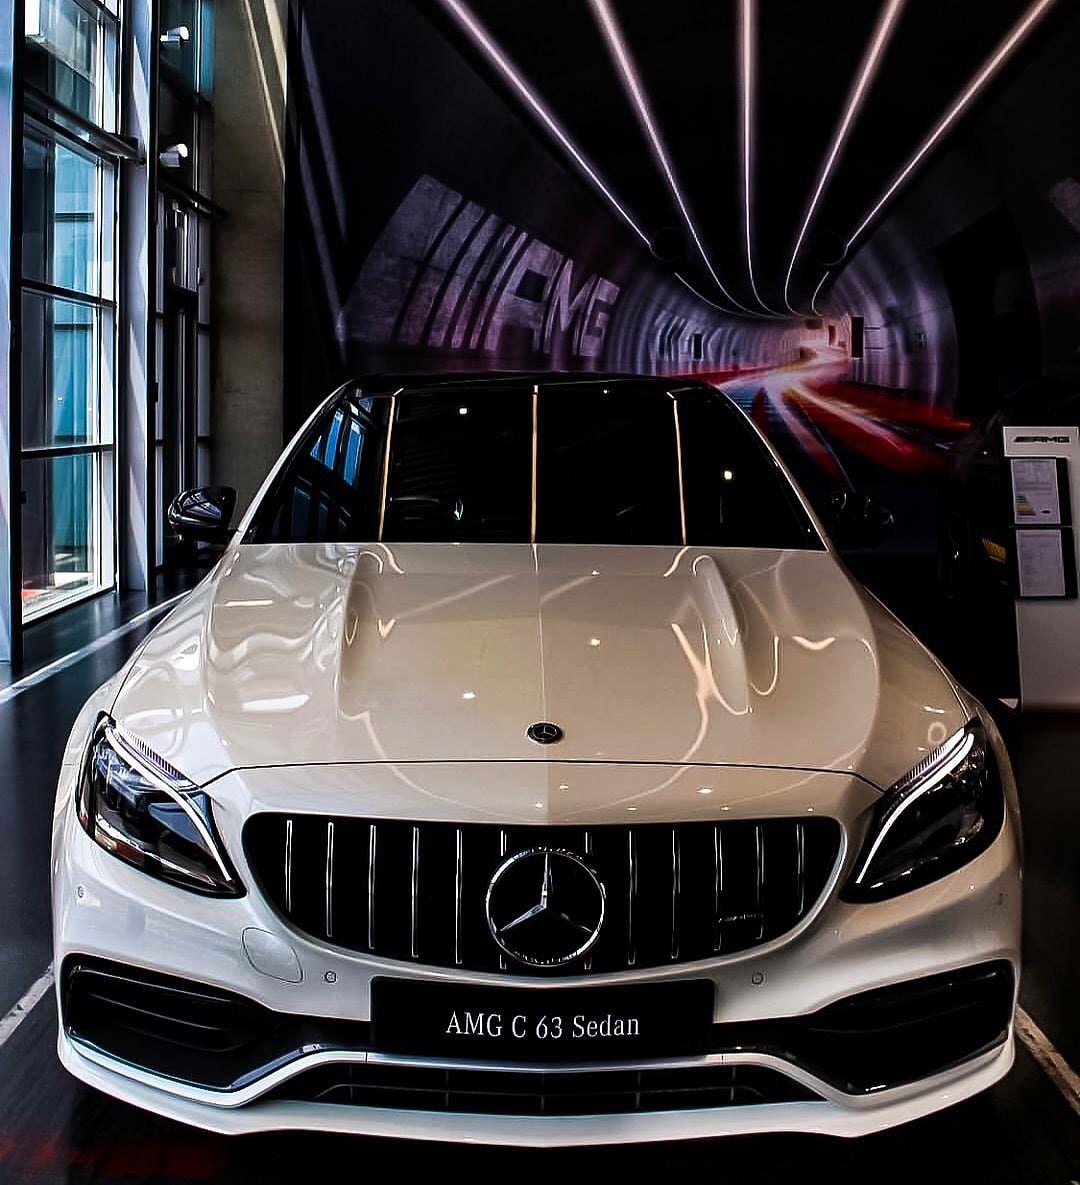 2019 Mercedes Amg C63s Mercedes Benz C63 Amg Mercedes Benz Amg